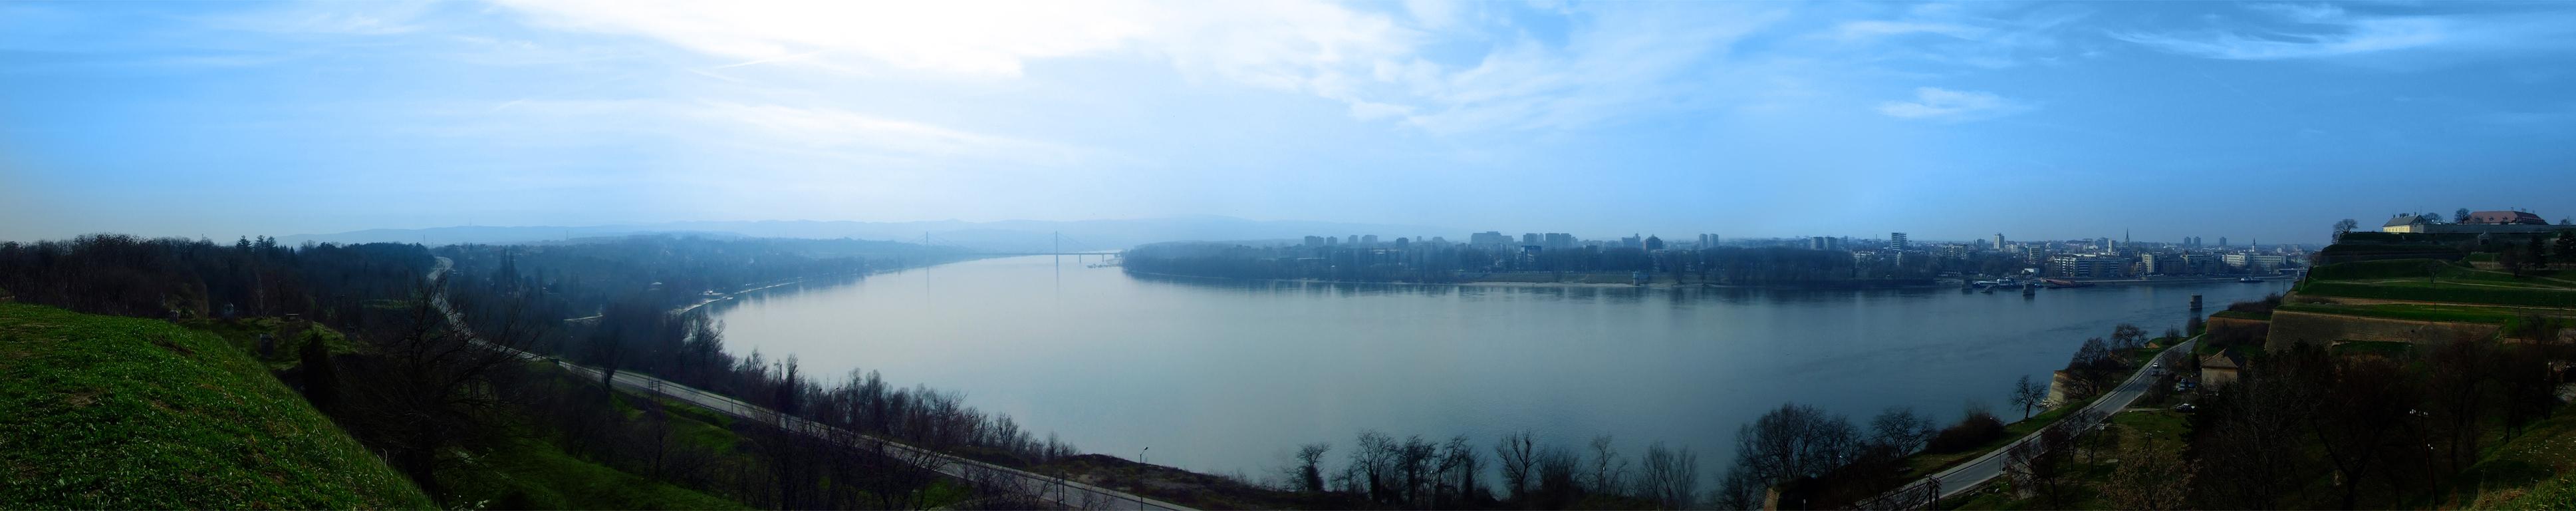 Novi Sad Panorama By Brkic87 On Deviantart